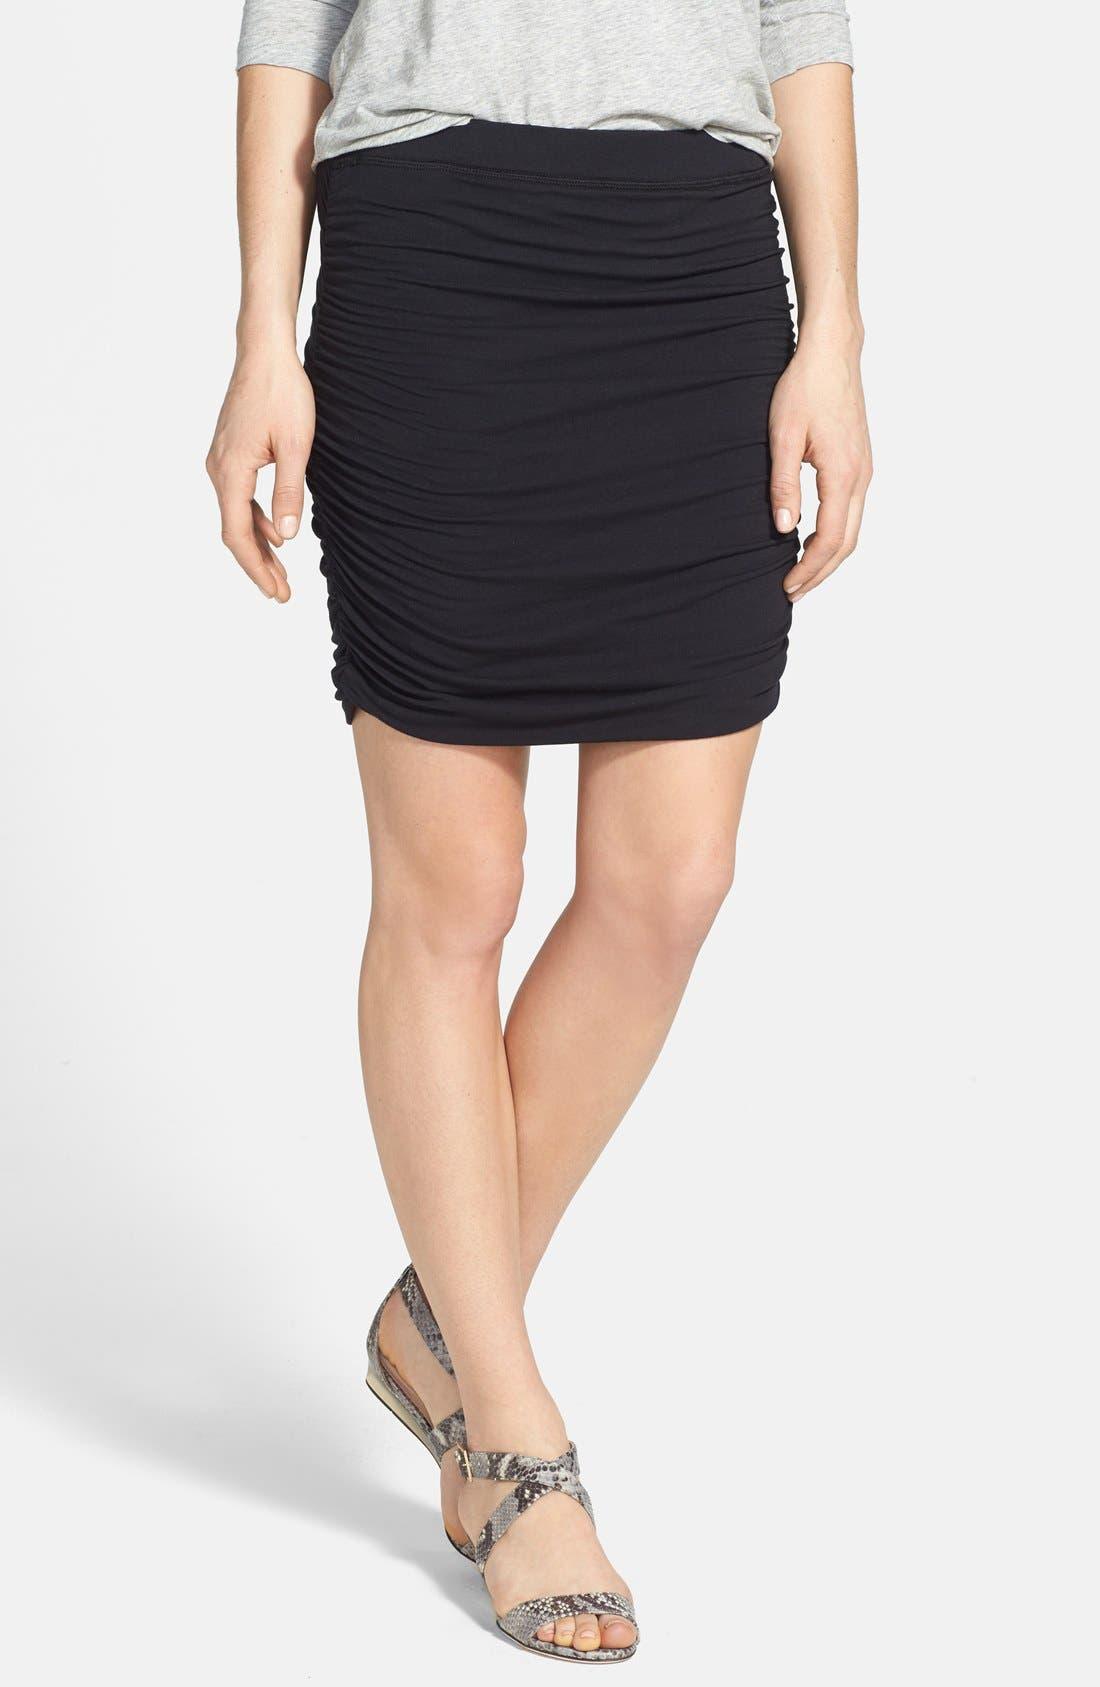 Alternate Image 1 Selected - Splendid Side Ruched Skirt